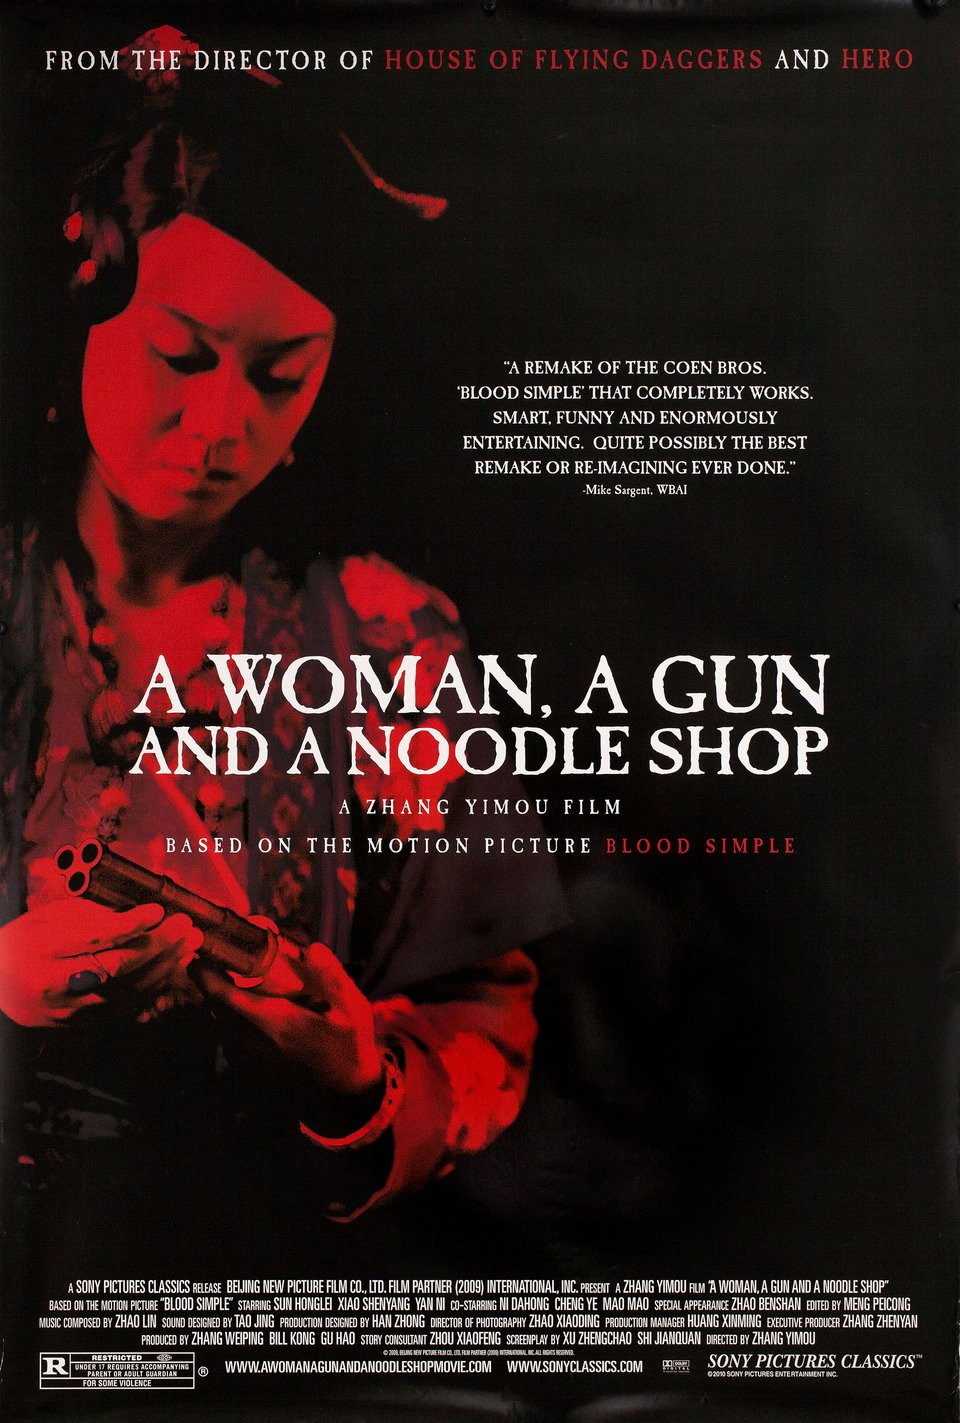 A Woman, a Gun and a Noodle Shop 2009 U.S. One Sheet Poster